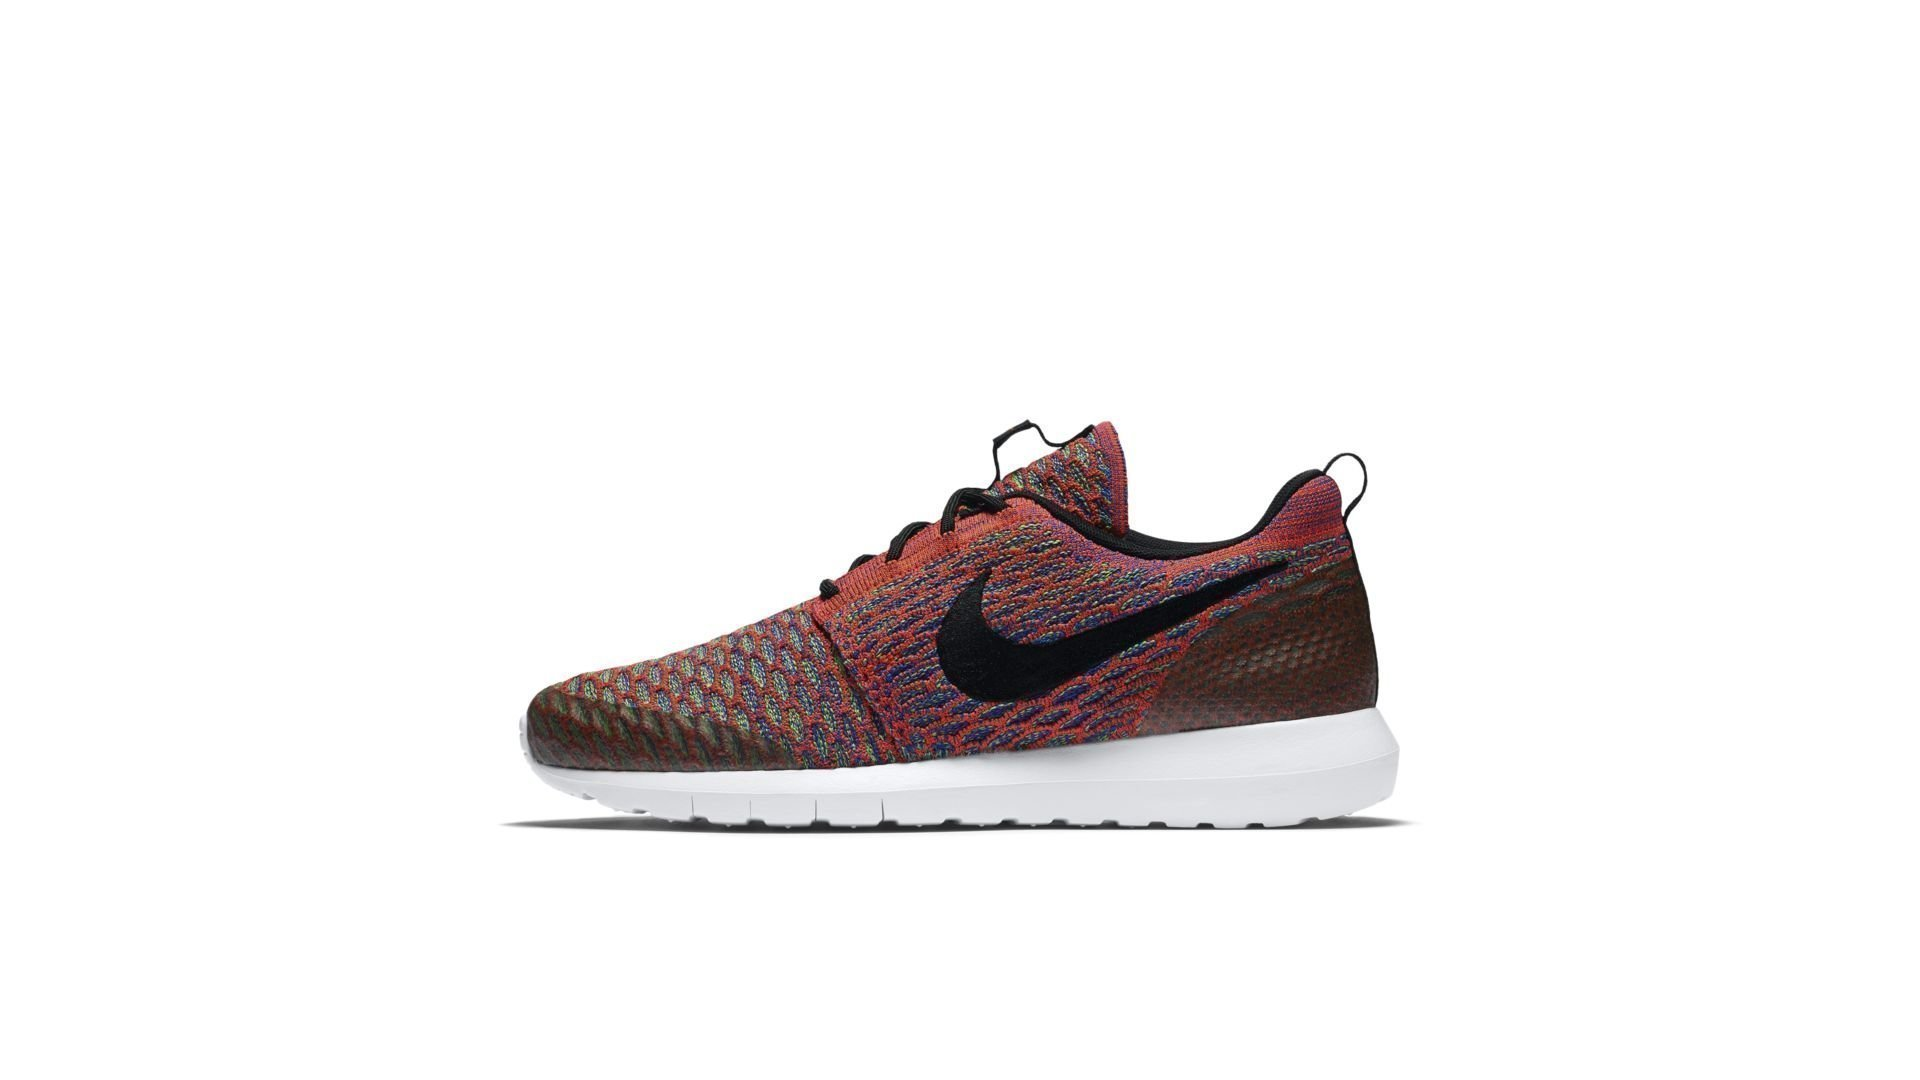 Nike Roshe NM Flyknit Bright Crimson Multi-Color (816531-600)